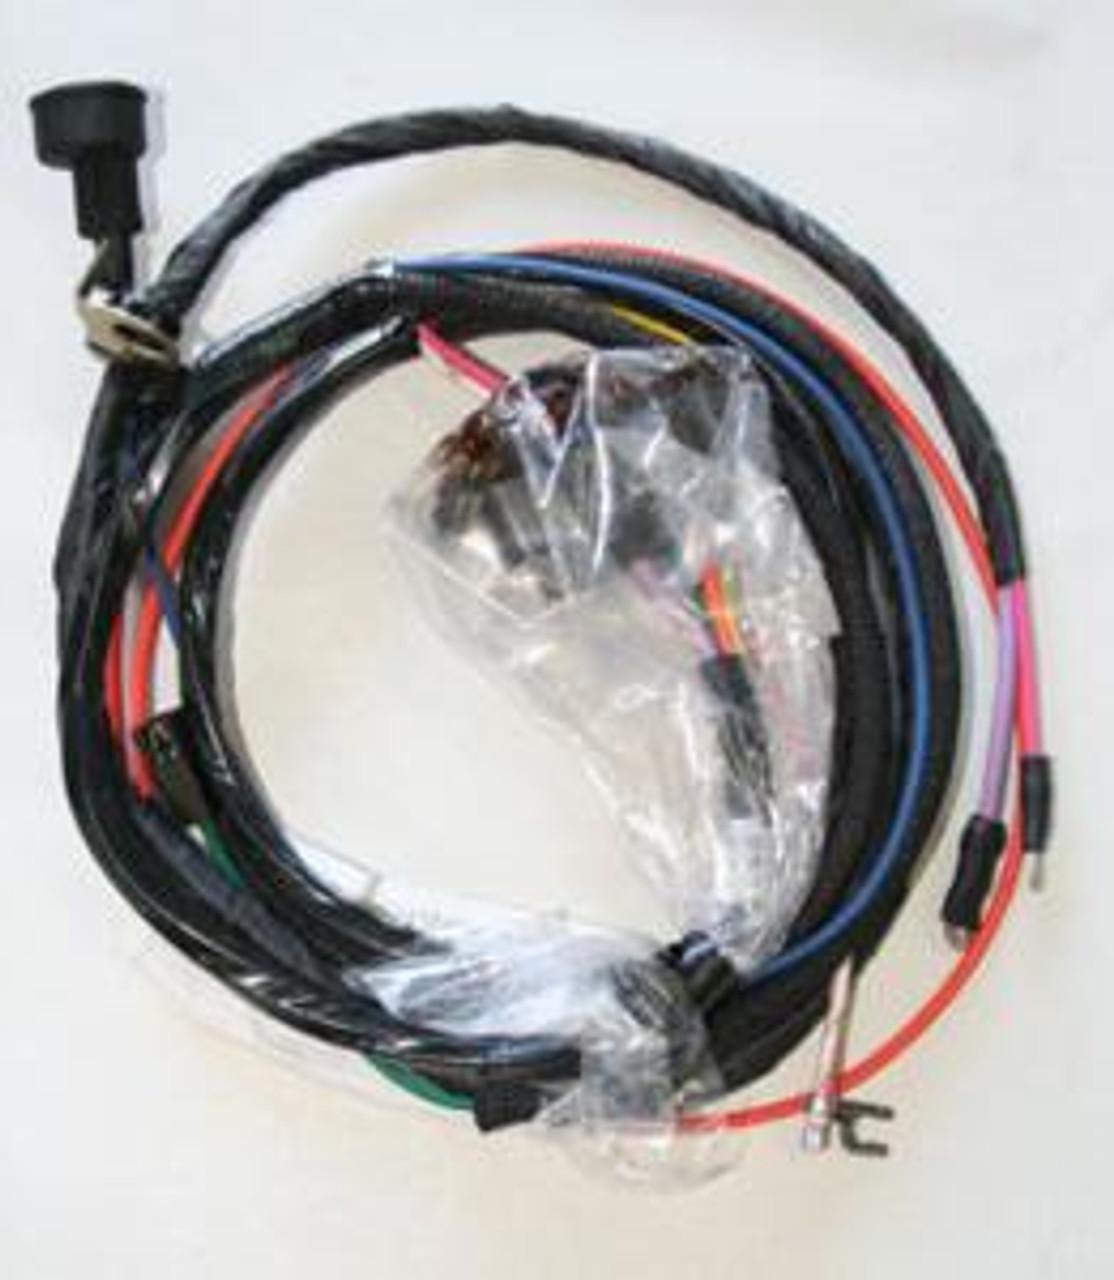 67 Malibu Wiring Harness - Jcb 520 Load All Wiring Schematics for Wiring  Diagram SchematicsWiring Diagram Schematics